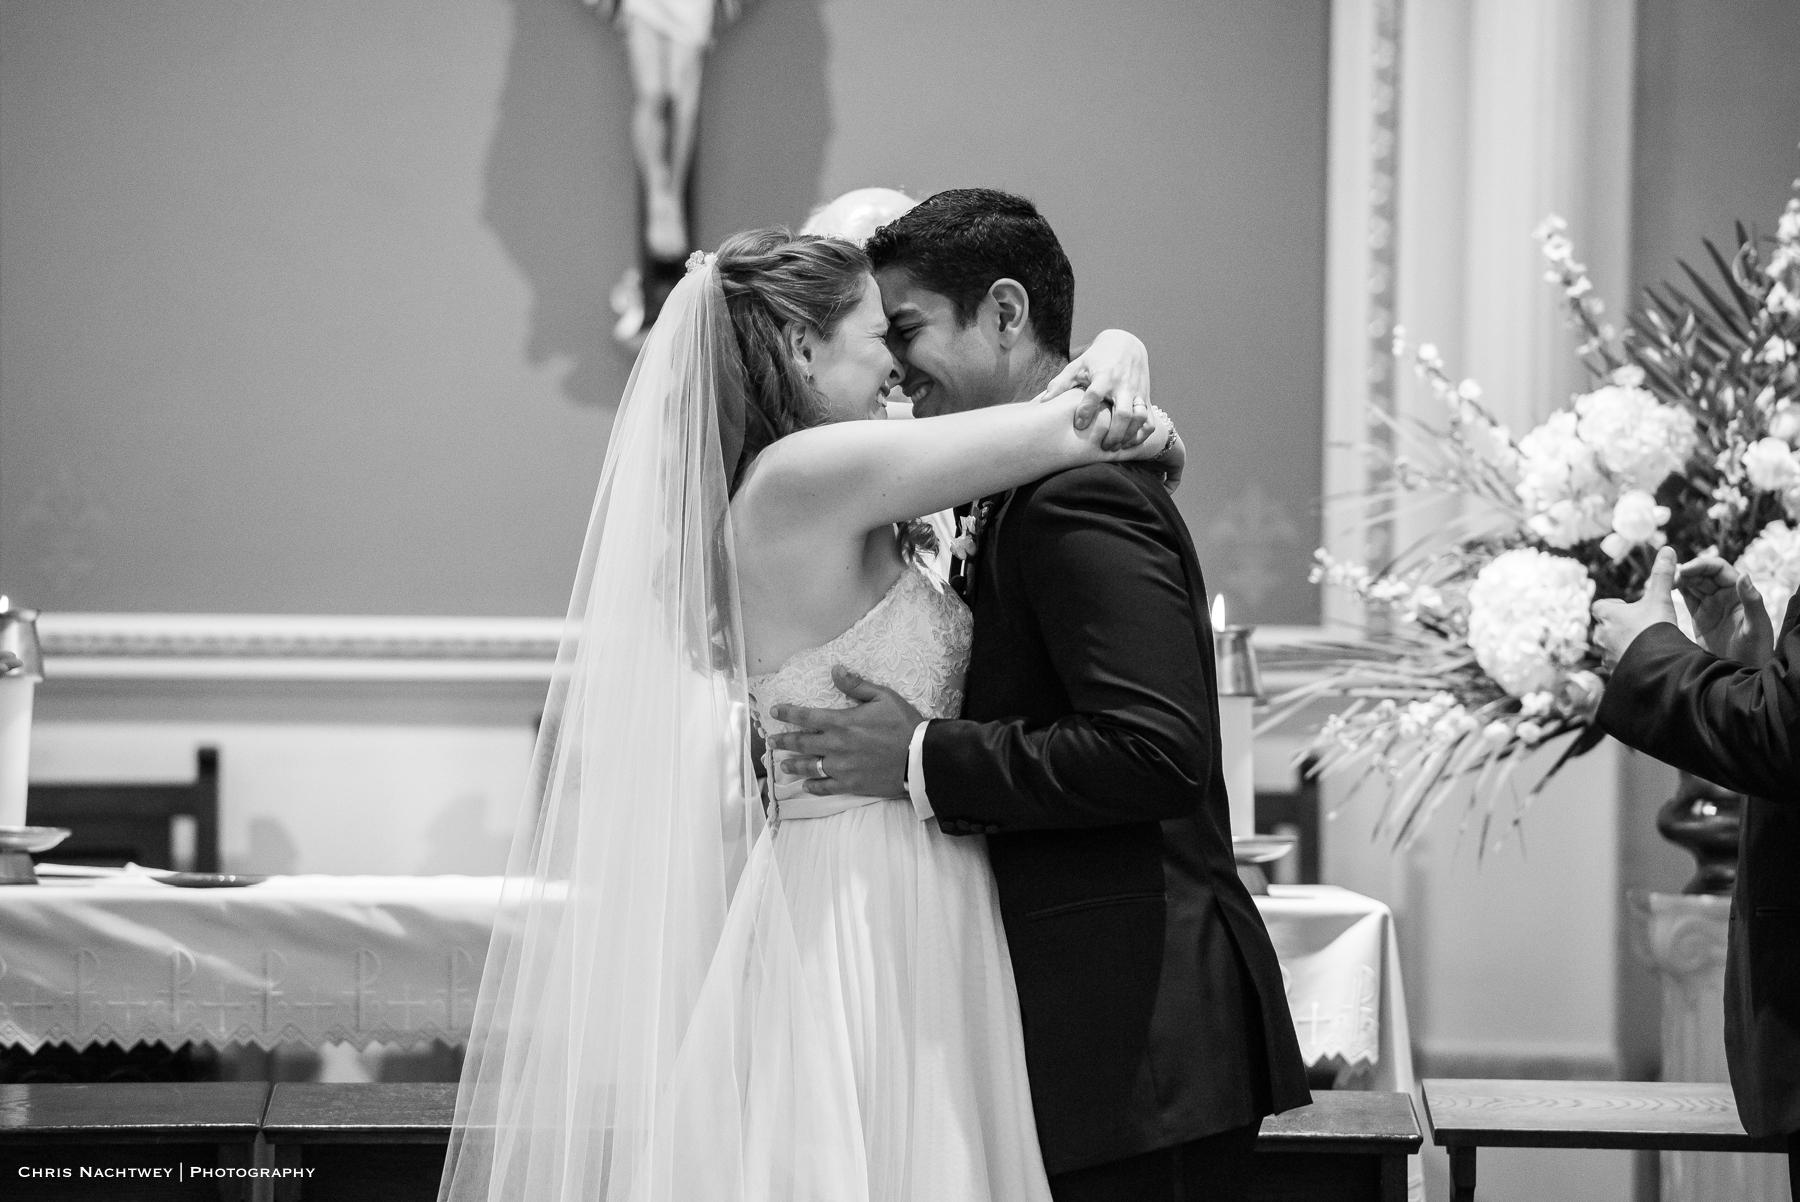 wedding-the-litchfield-inn-ct-photos-chris-nachtwey-photography-2018-32.jpg